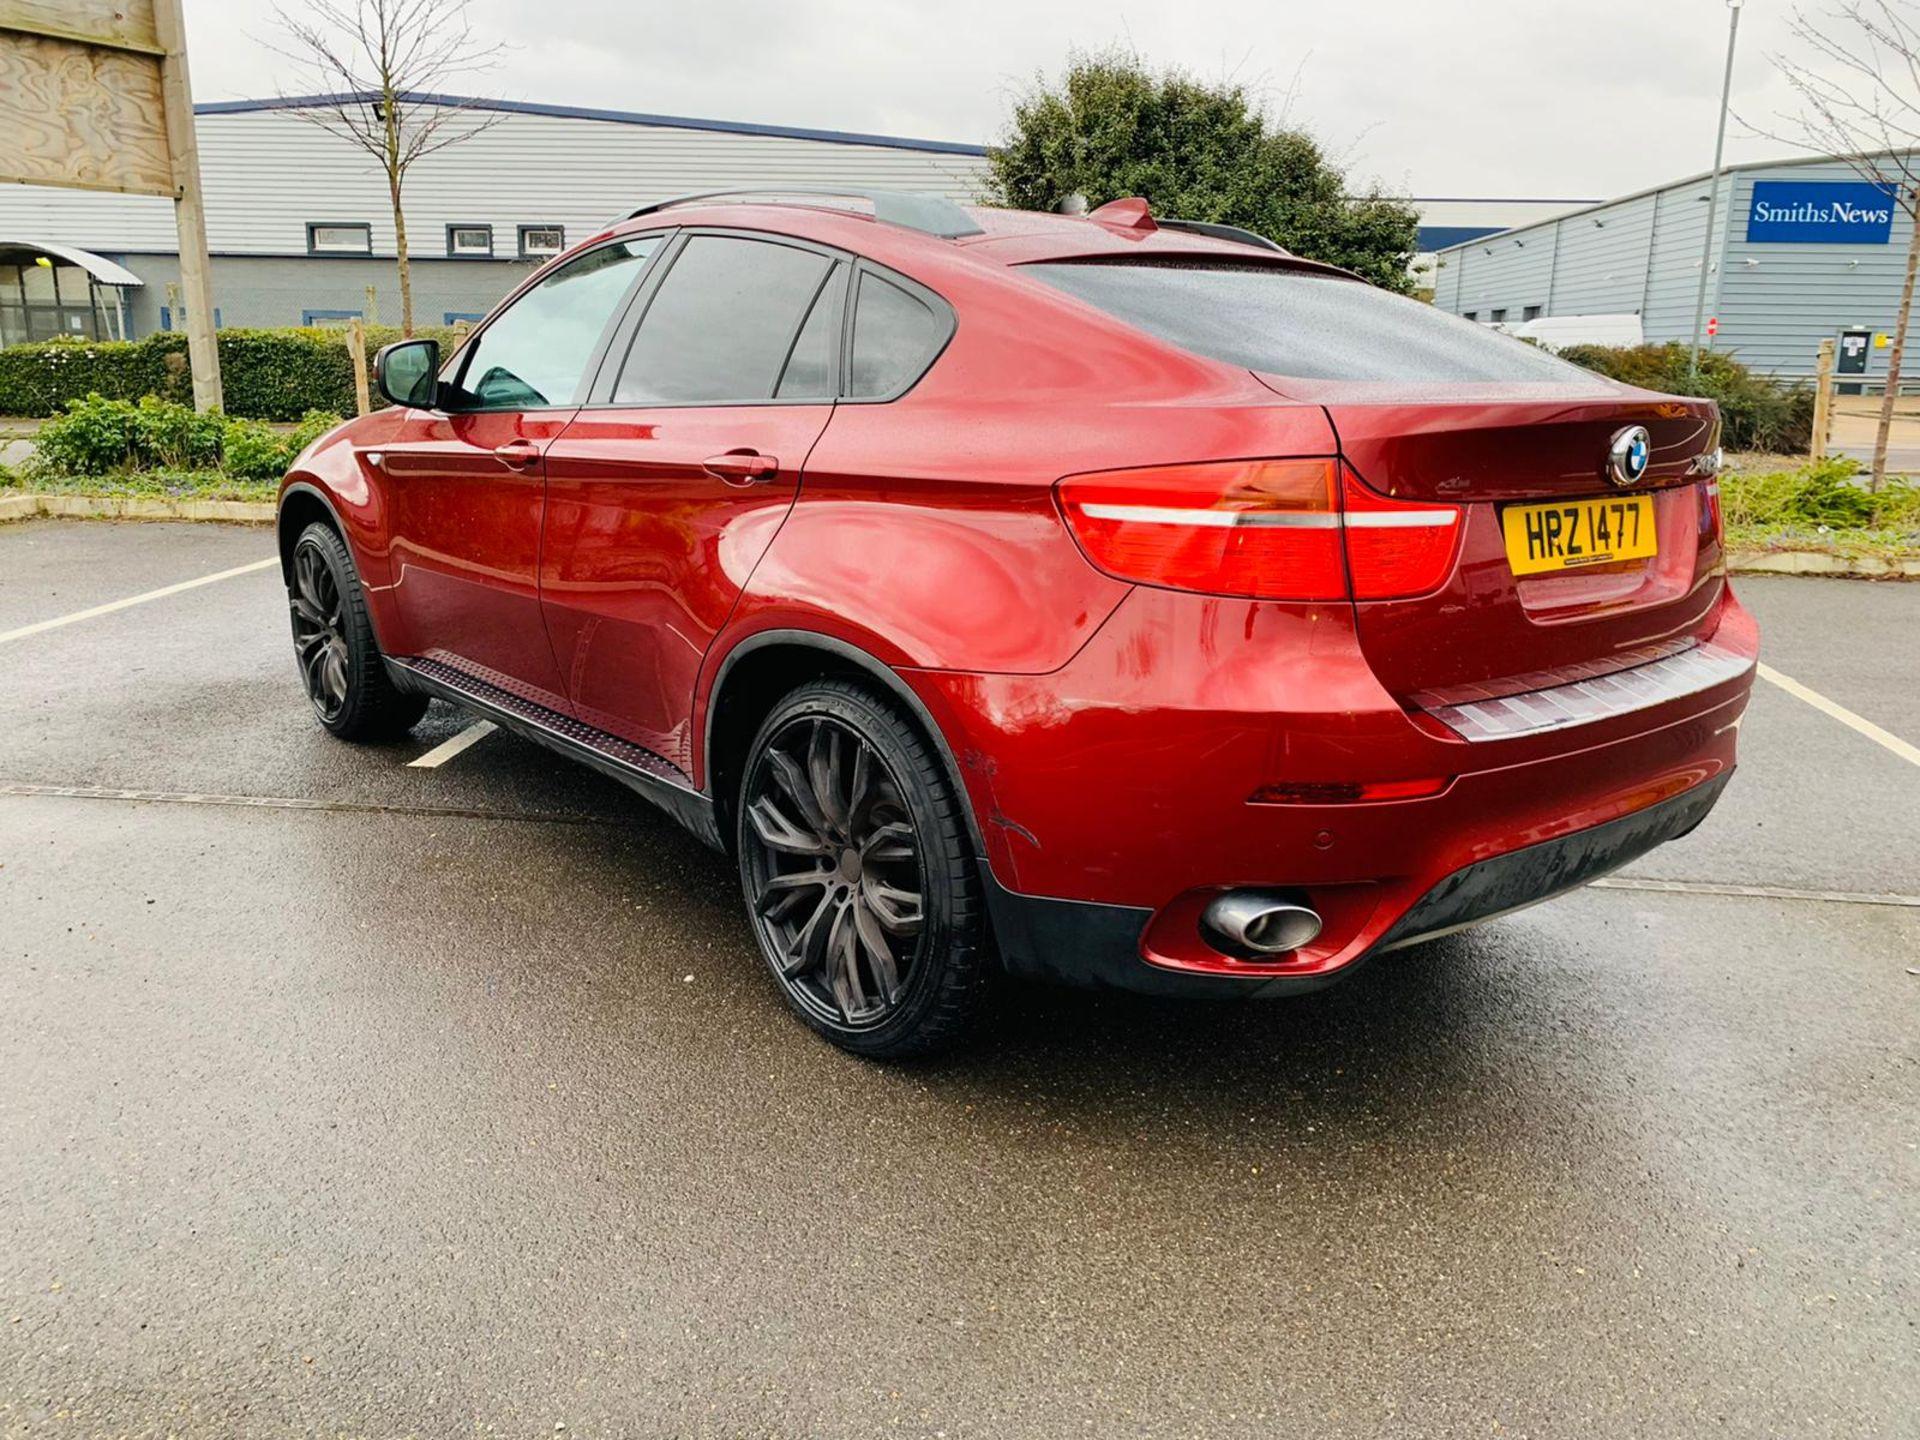 Reseve Met - BMW X6 xDrive 3.0d Auto - 2014 Reg - Leather Interior -Parking Sensors - Reversing Cam - Image 9 of 30